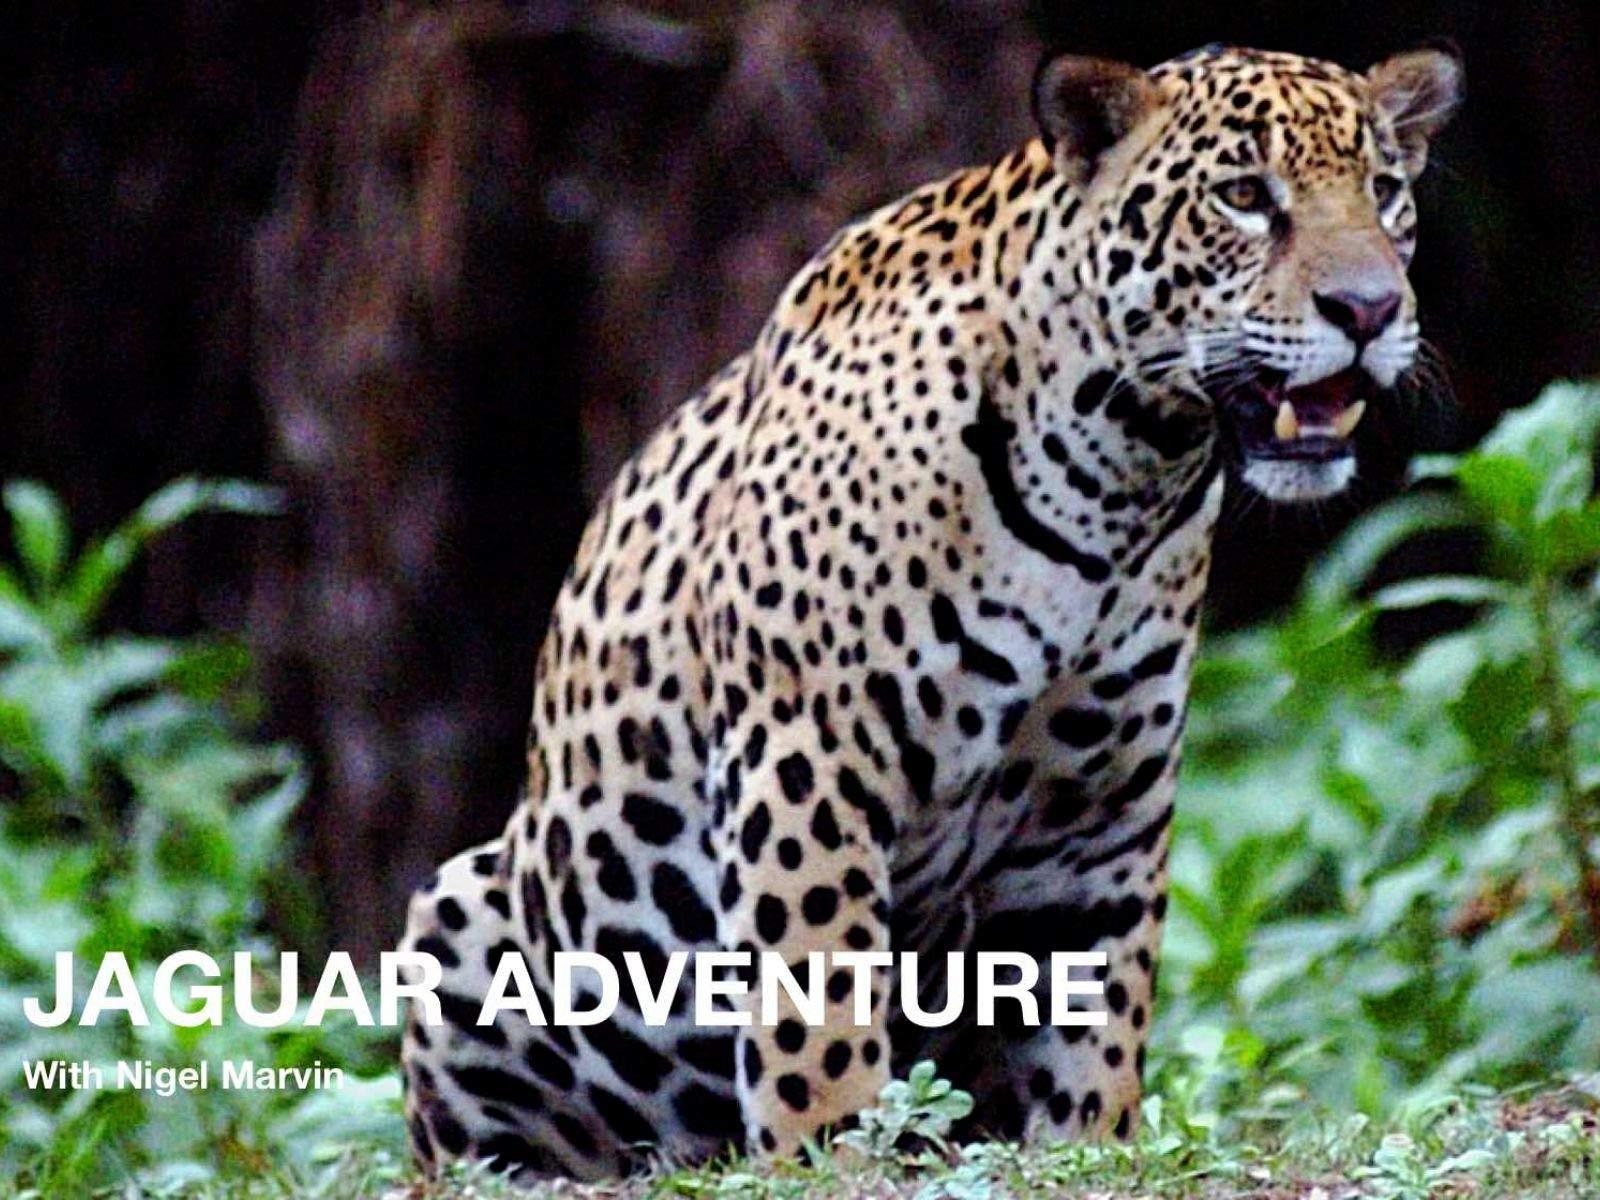 Jaguar Adventure with Nigel Marven - Season 1